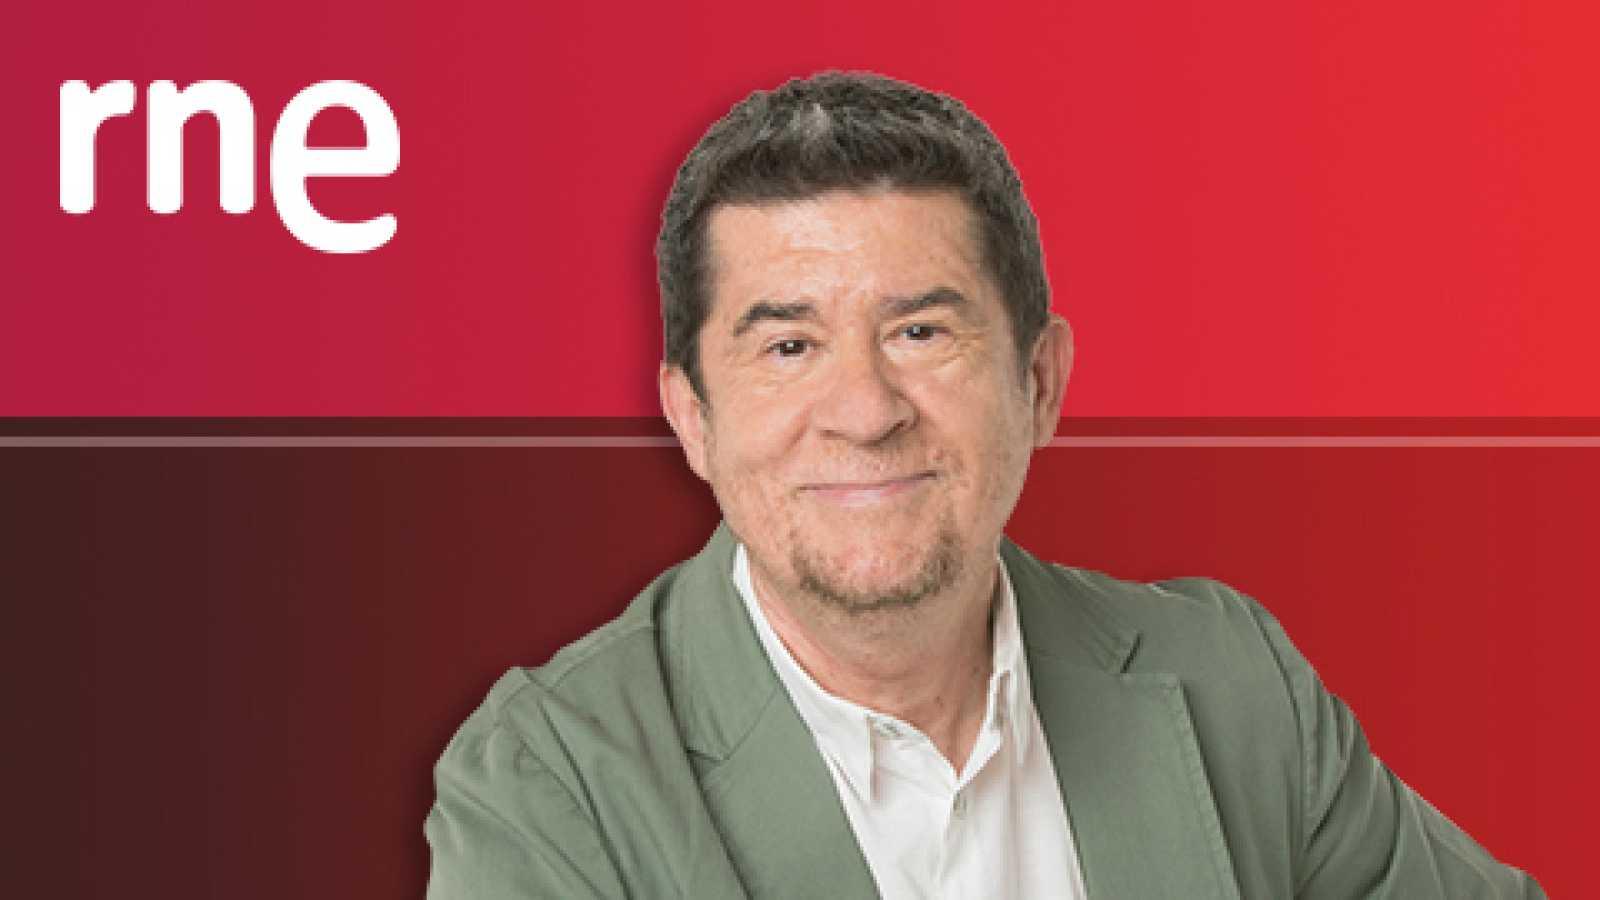 Entre dos luces - La Orquesta de RTVE, monumental - 11/09/19 - escuchar ahora